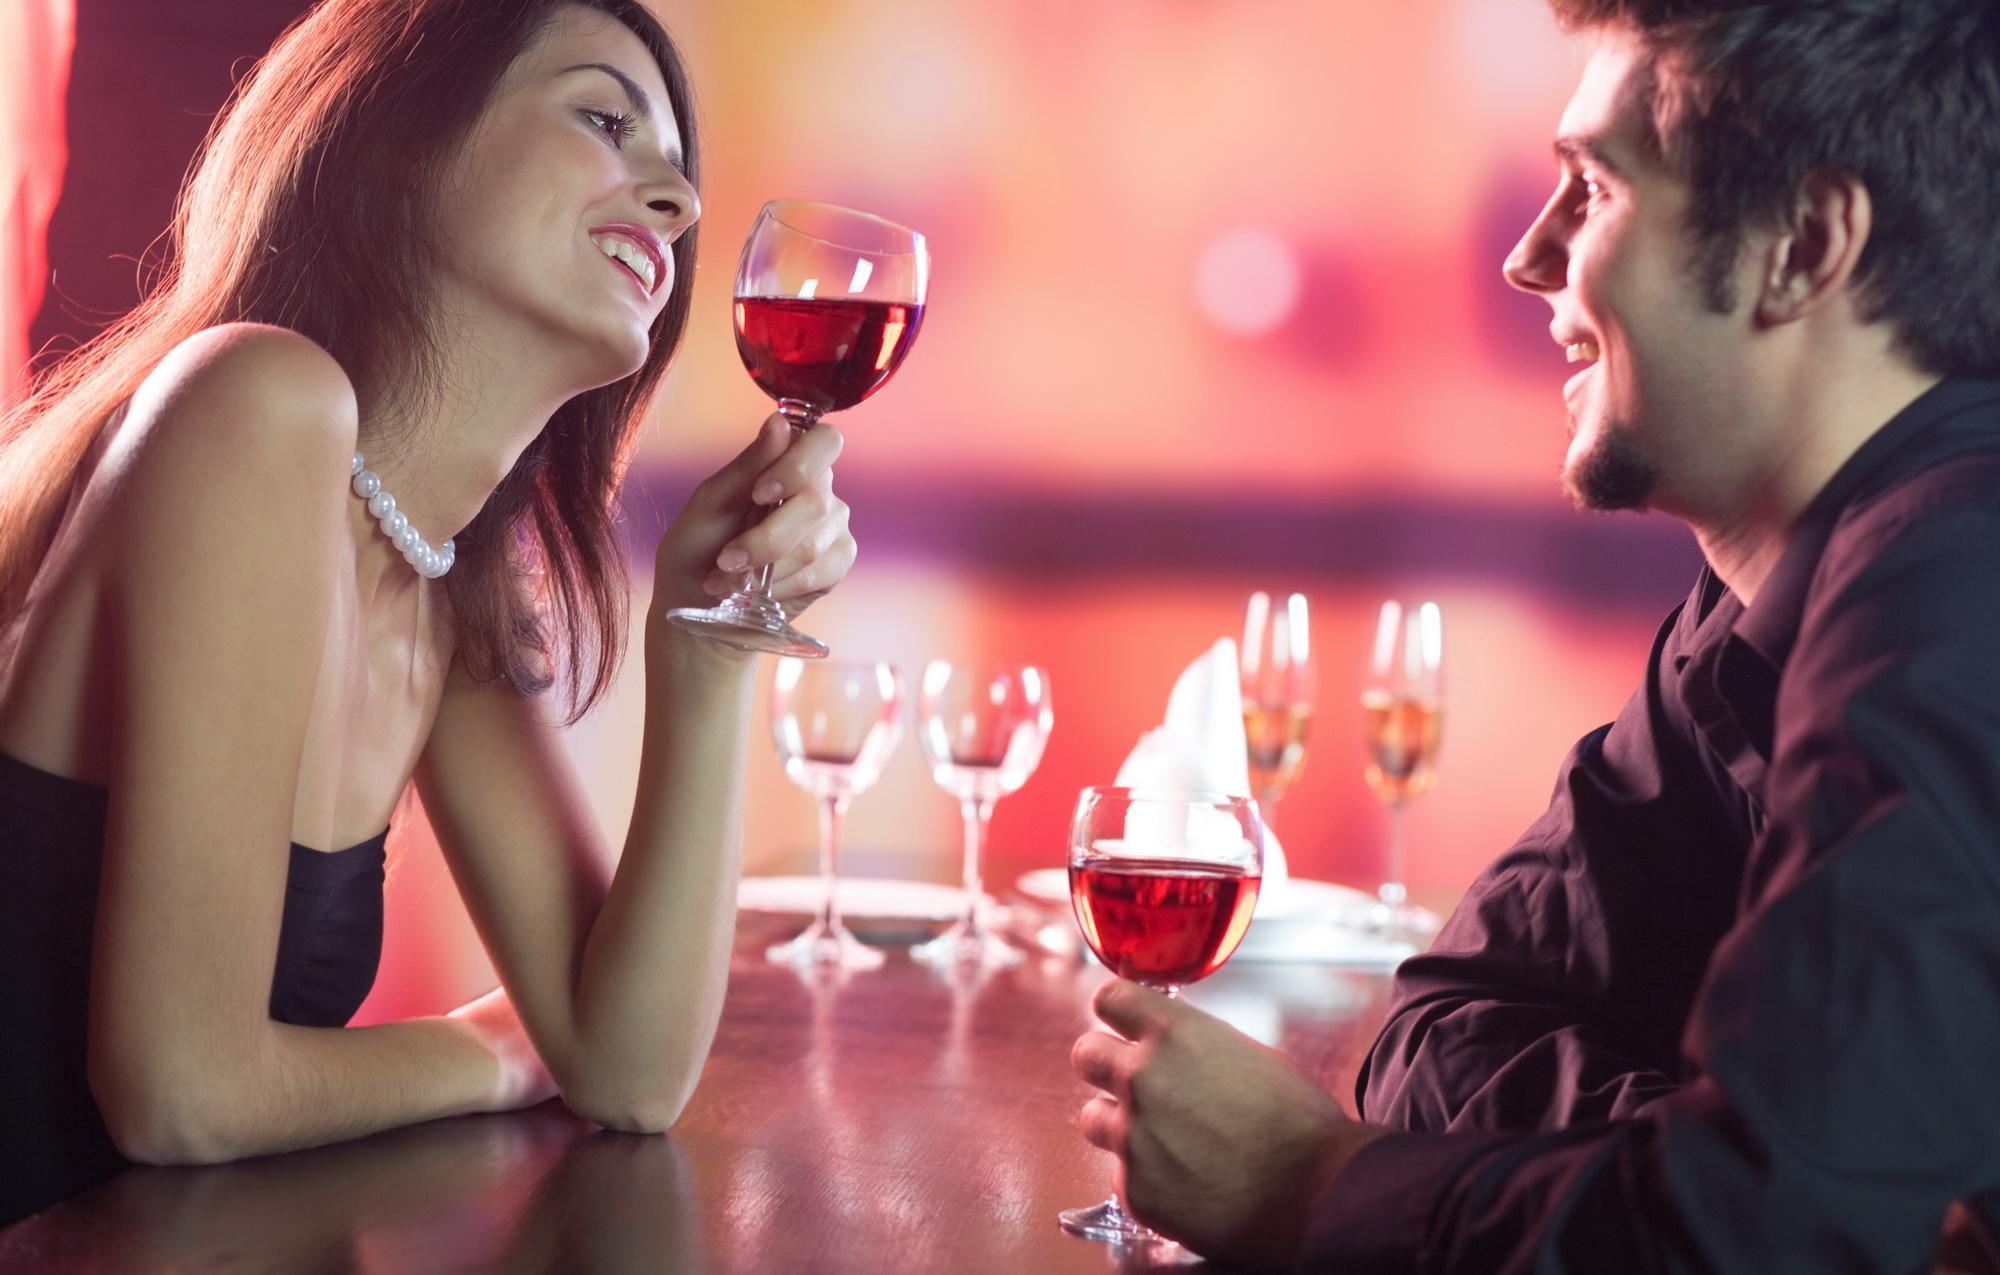 того, девушки сгорающие от нетерпения на свиданиях секс